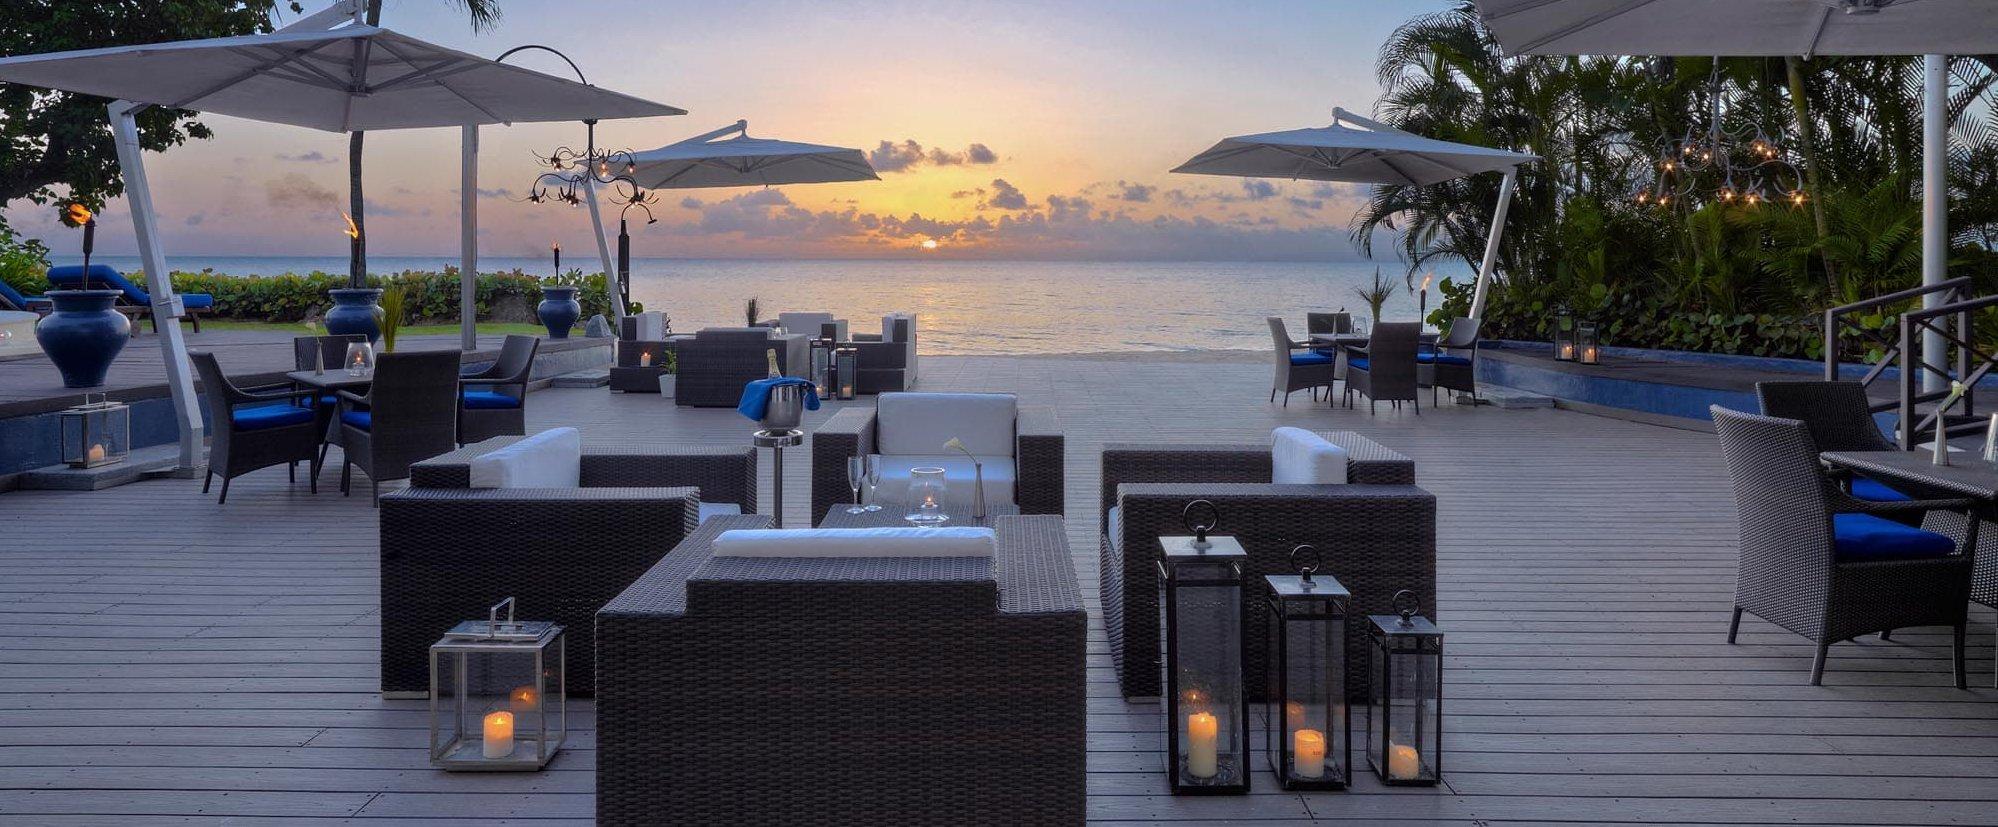 the-house-barbados-sundown-deck